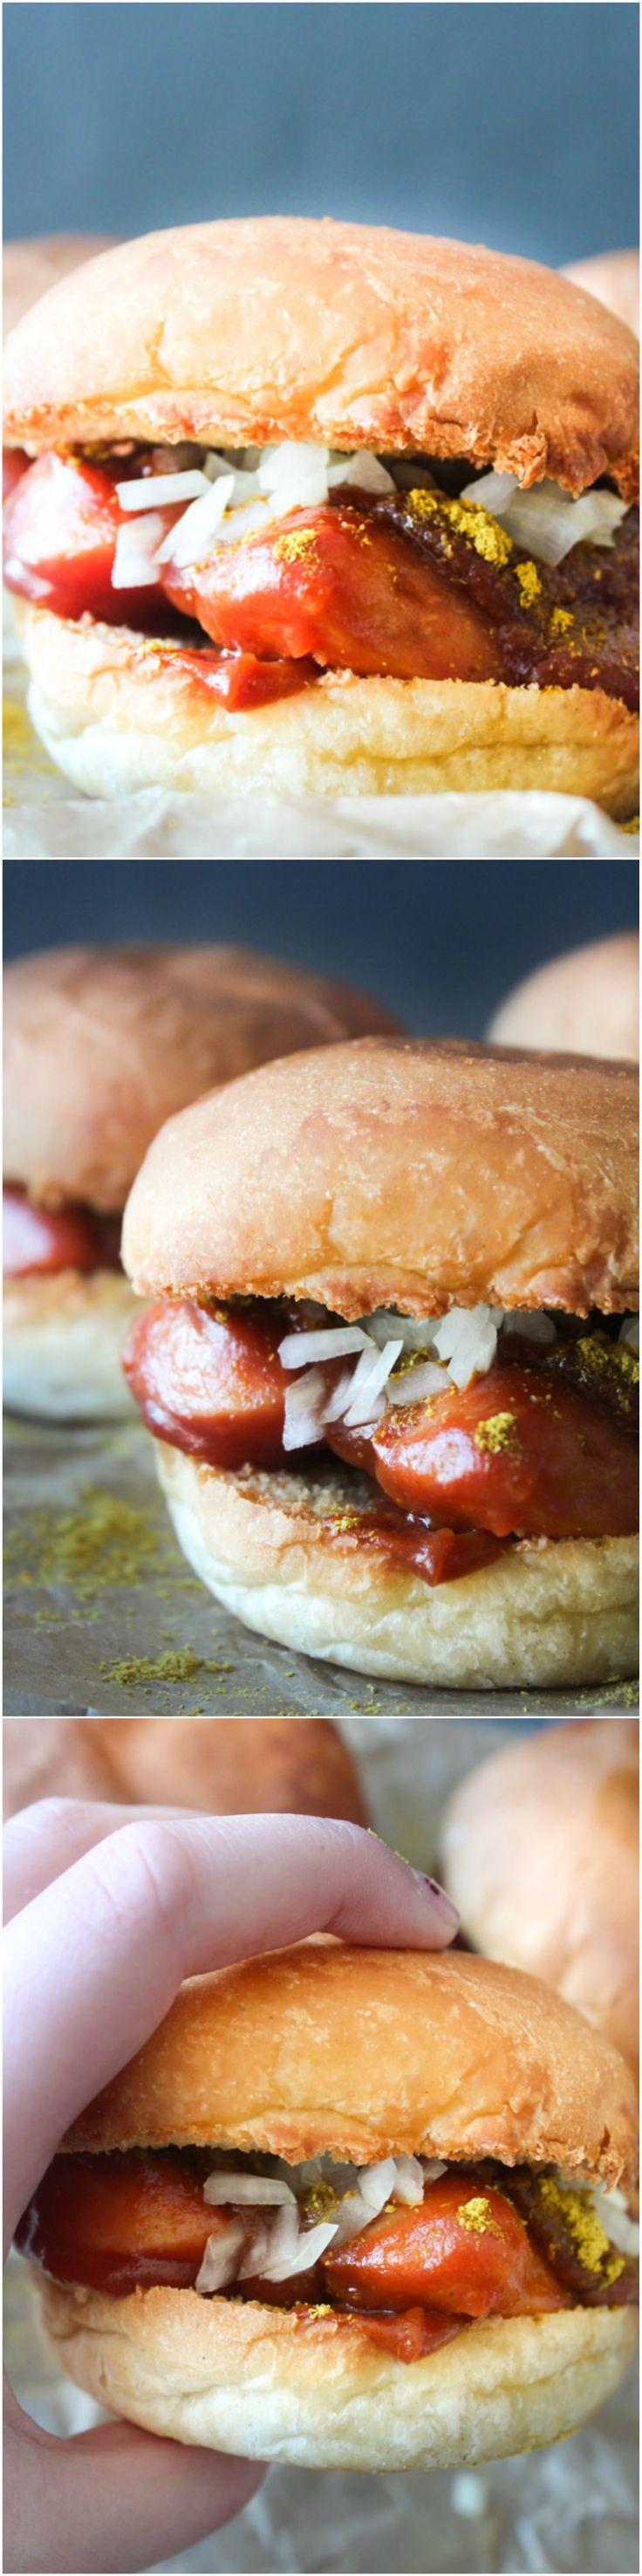 Easy Curry Wurst Sliders! Sausage Sliders